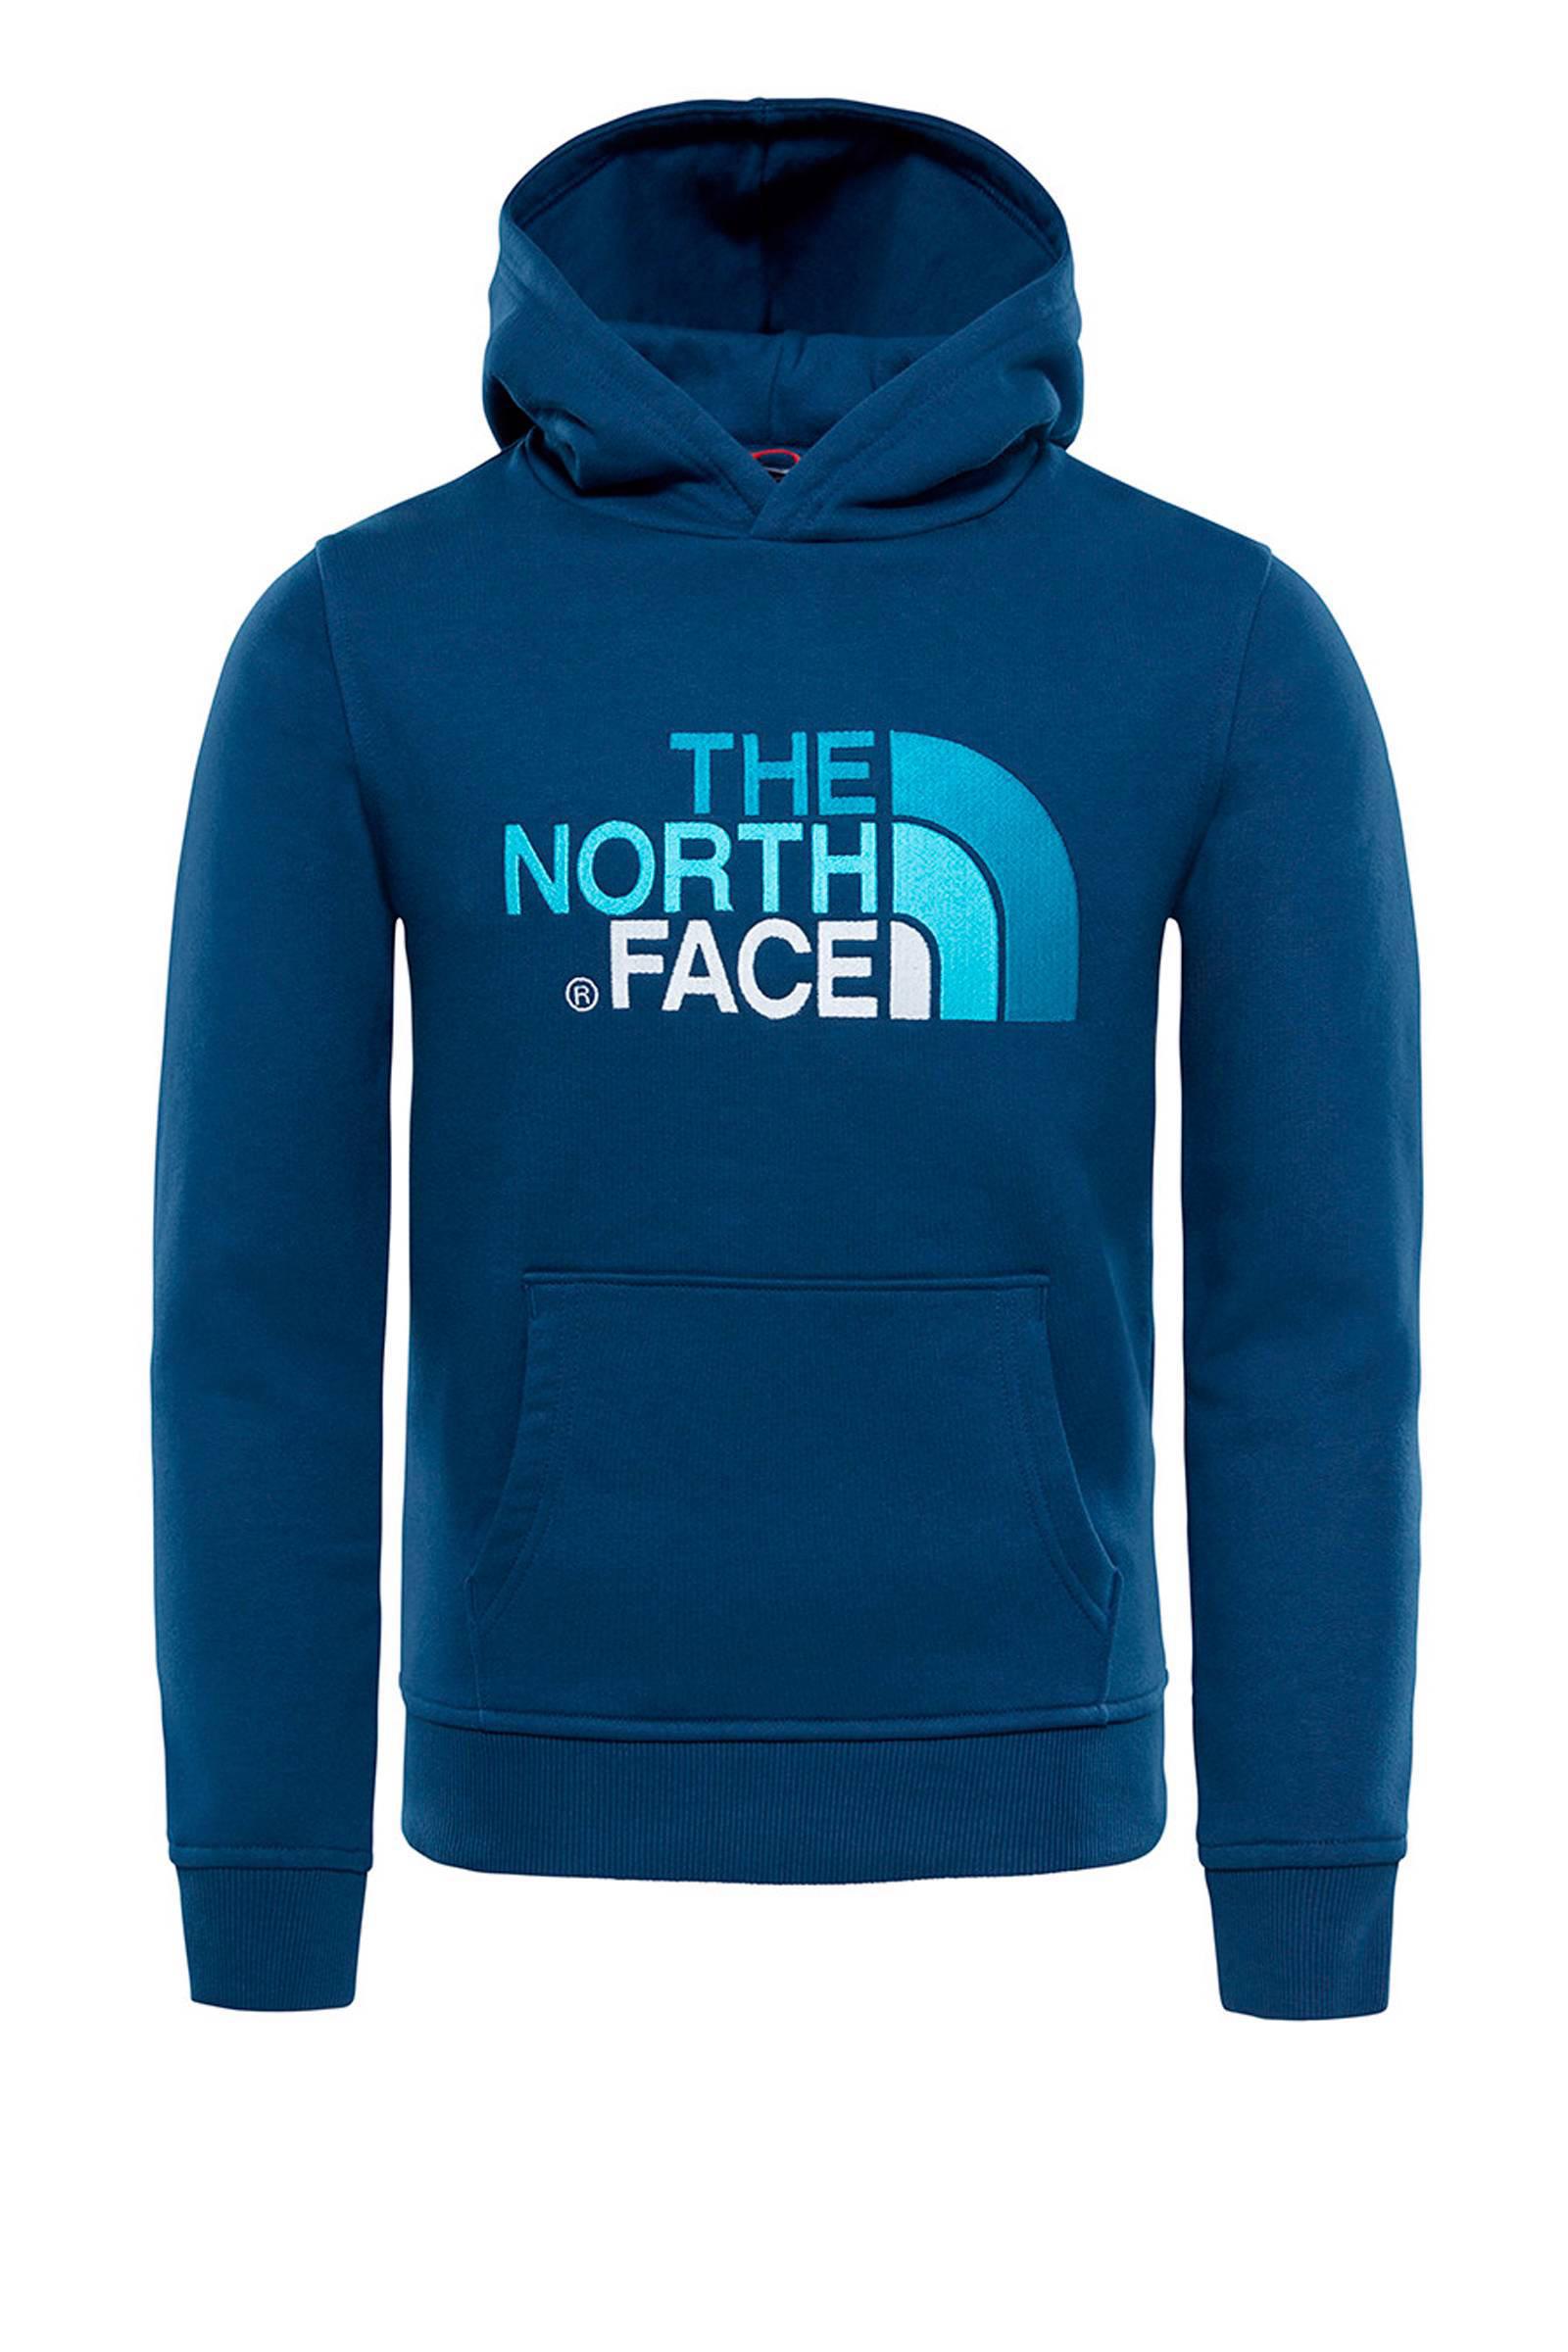 Kids North Face hoodies kopen? | BESLIST.nl | North Face